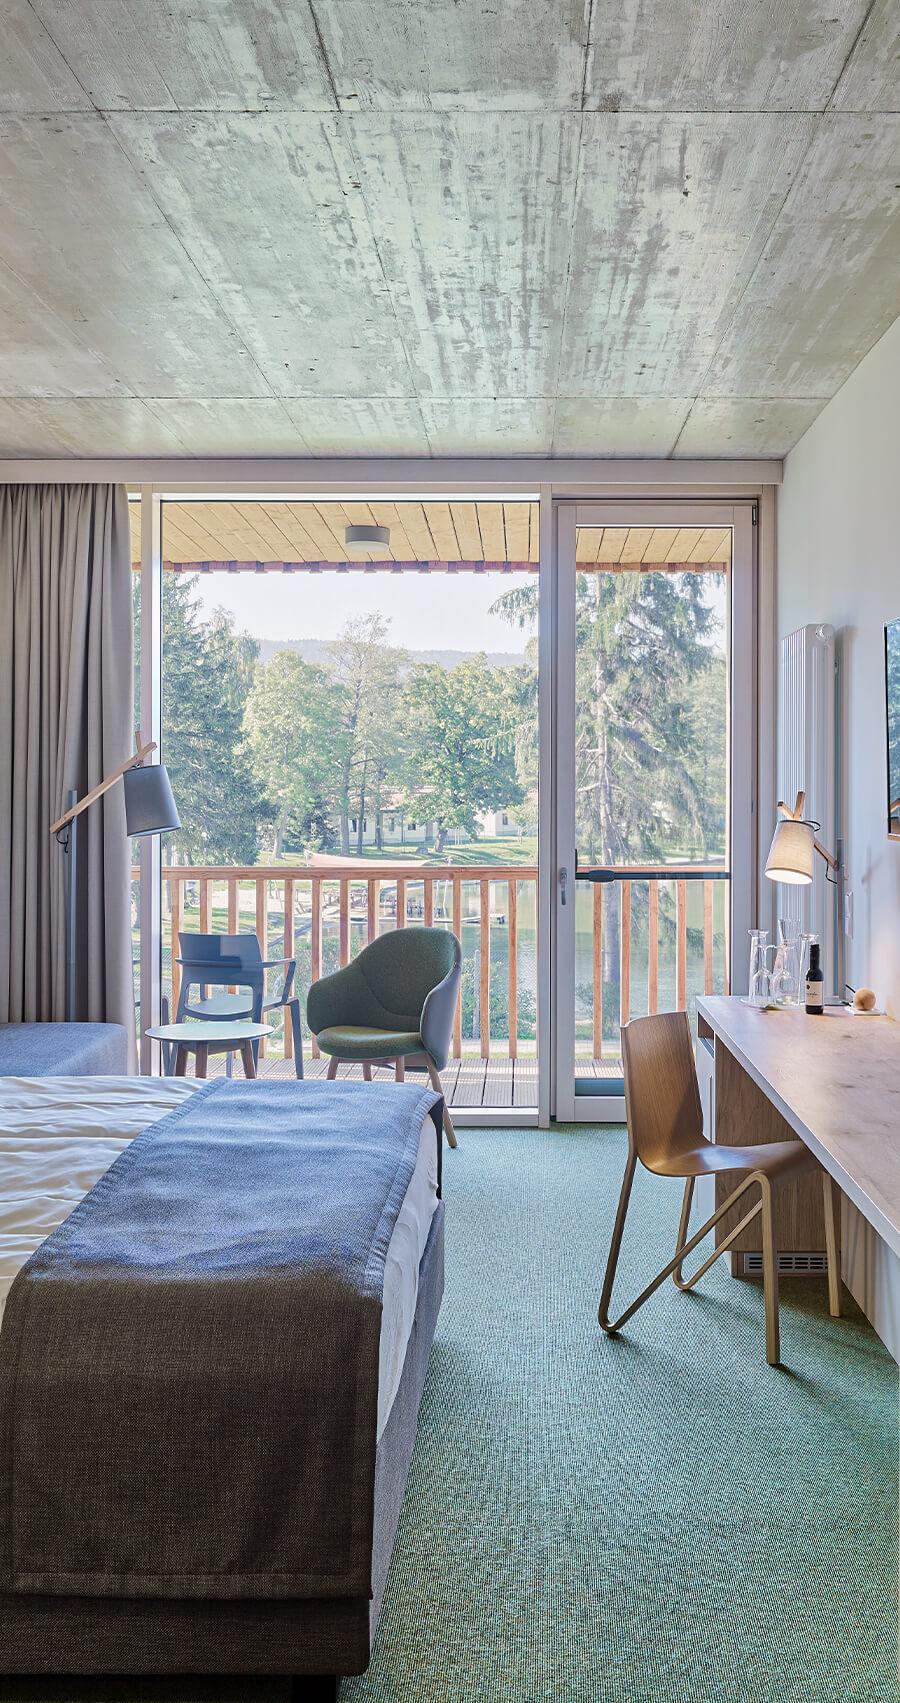 waldstrand-hotel-mobil